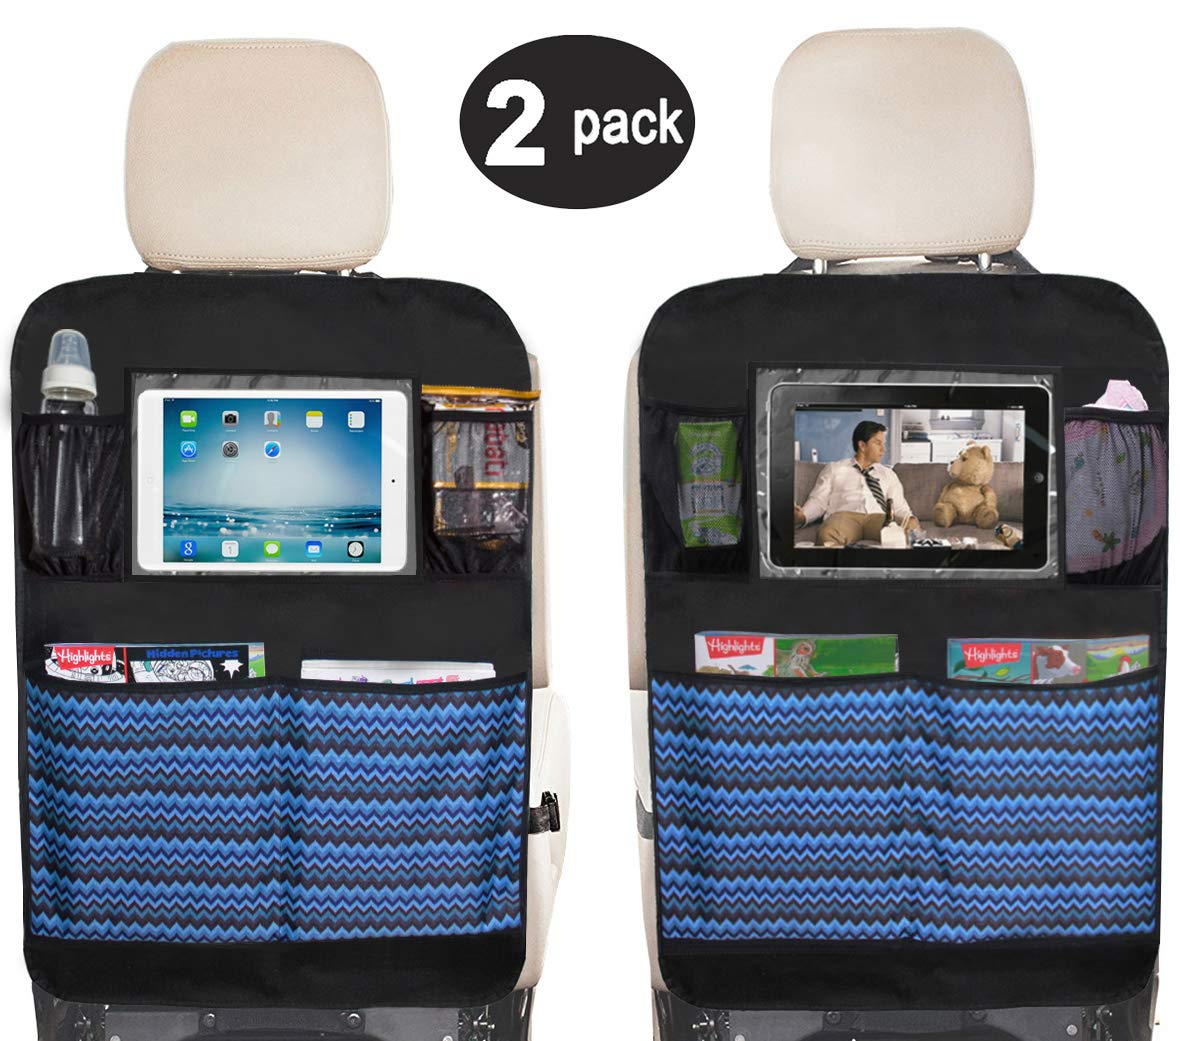 Sleeping Lamb Waterproof Kick Mats Car Seat Back Protectors with Clear 10'' Ipad Holder + 4 Storage Pockets Backseat Organizer (2 Pack)